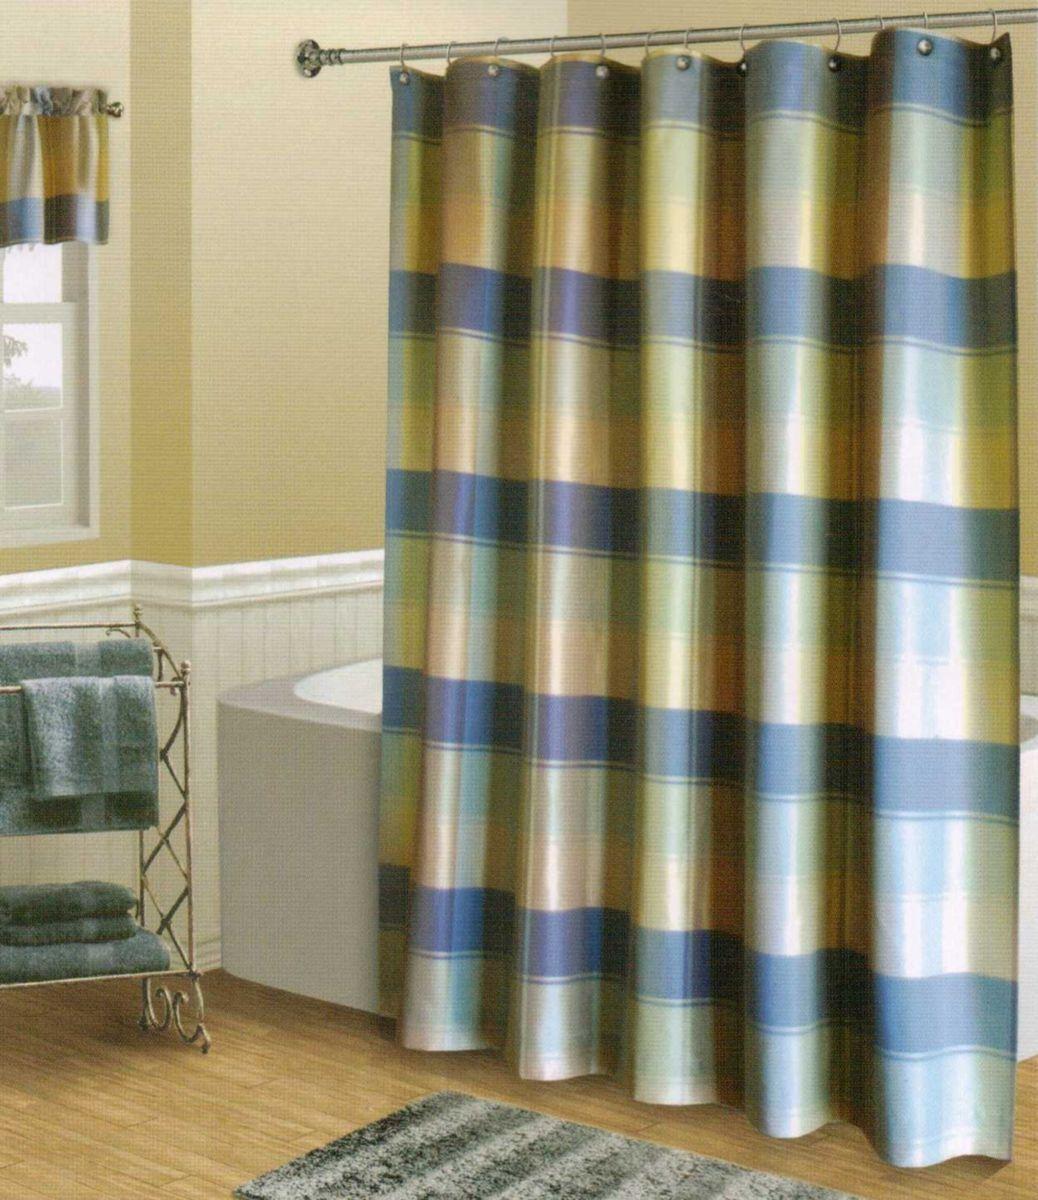 Plaid Blue Green Tan Textured Luxury Fabric Shower Curtain New